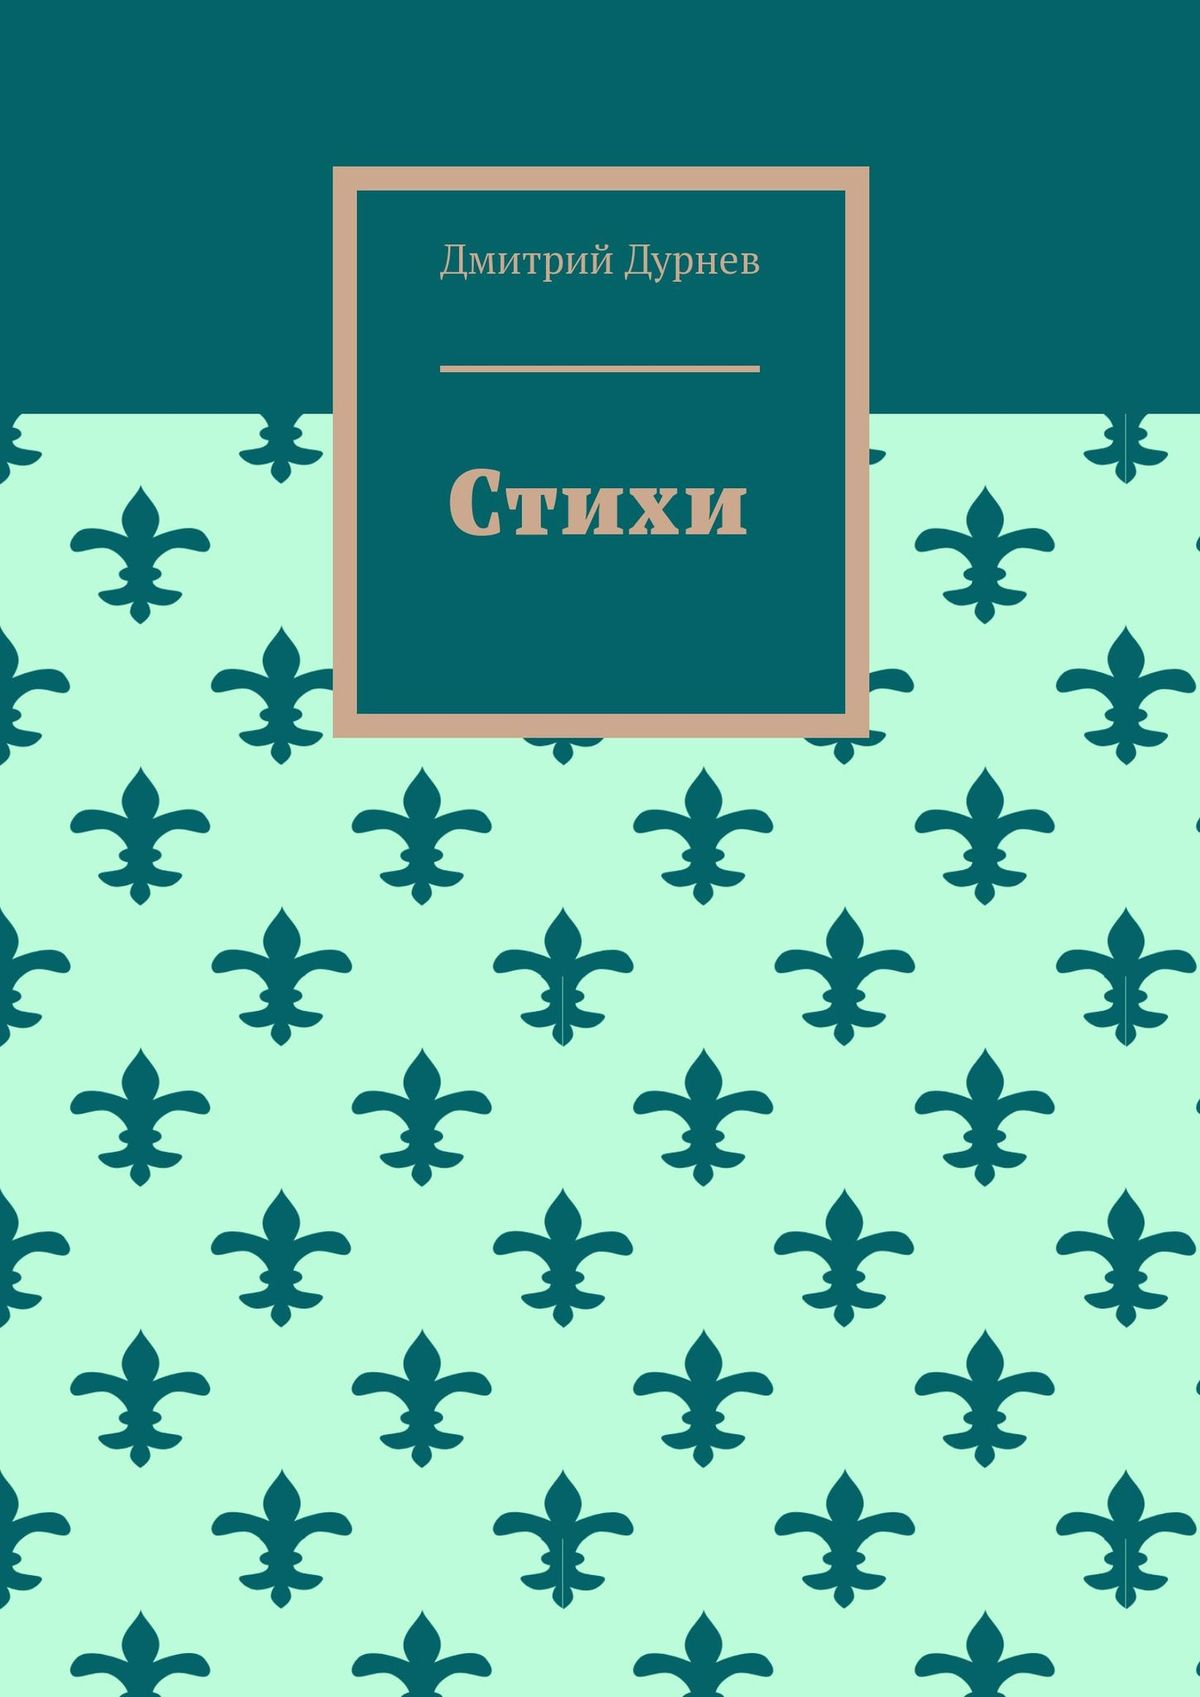 Дмитрий Дурнев Стихи яков быль кому то густо акому то пусто